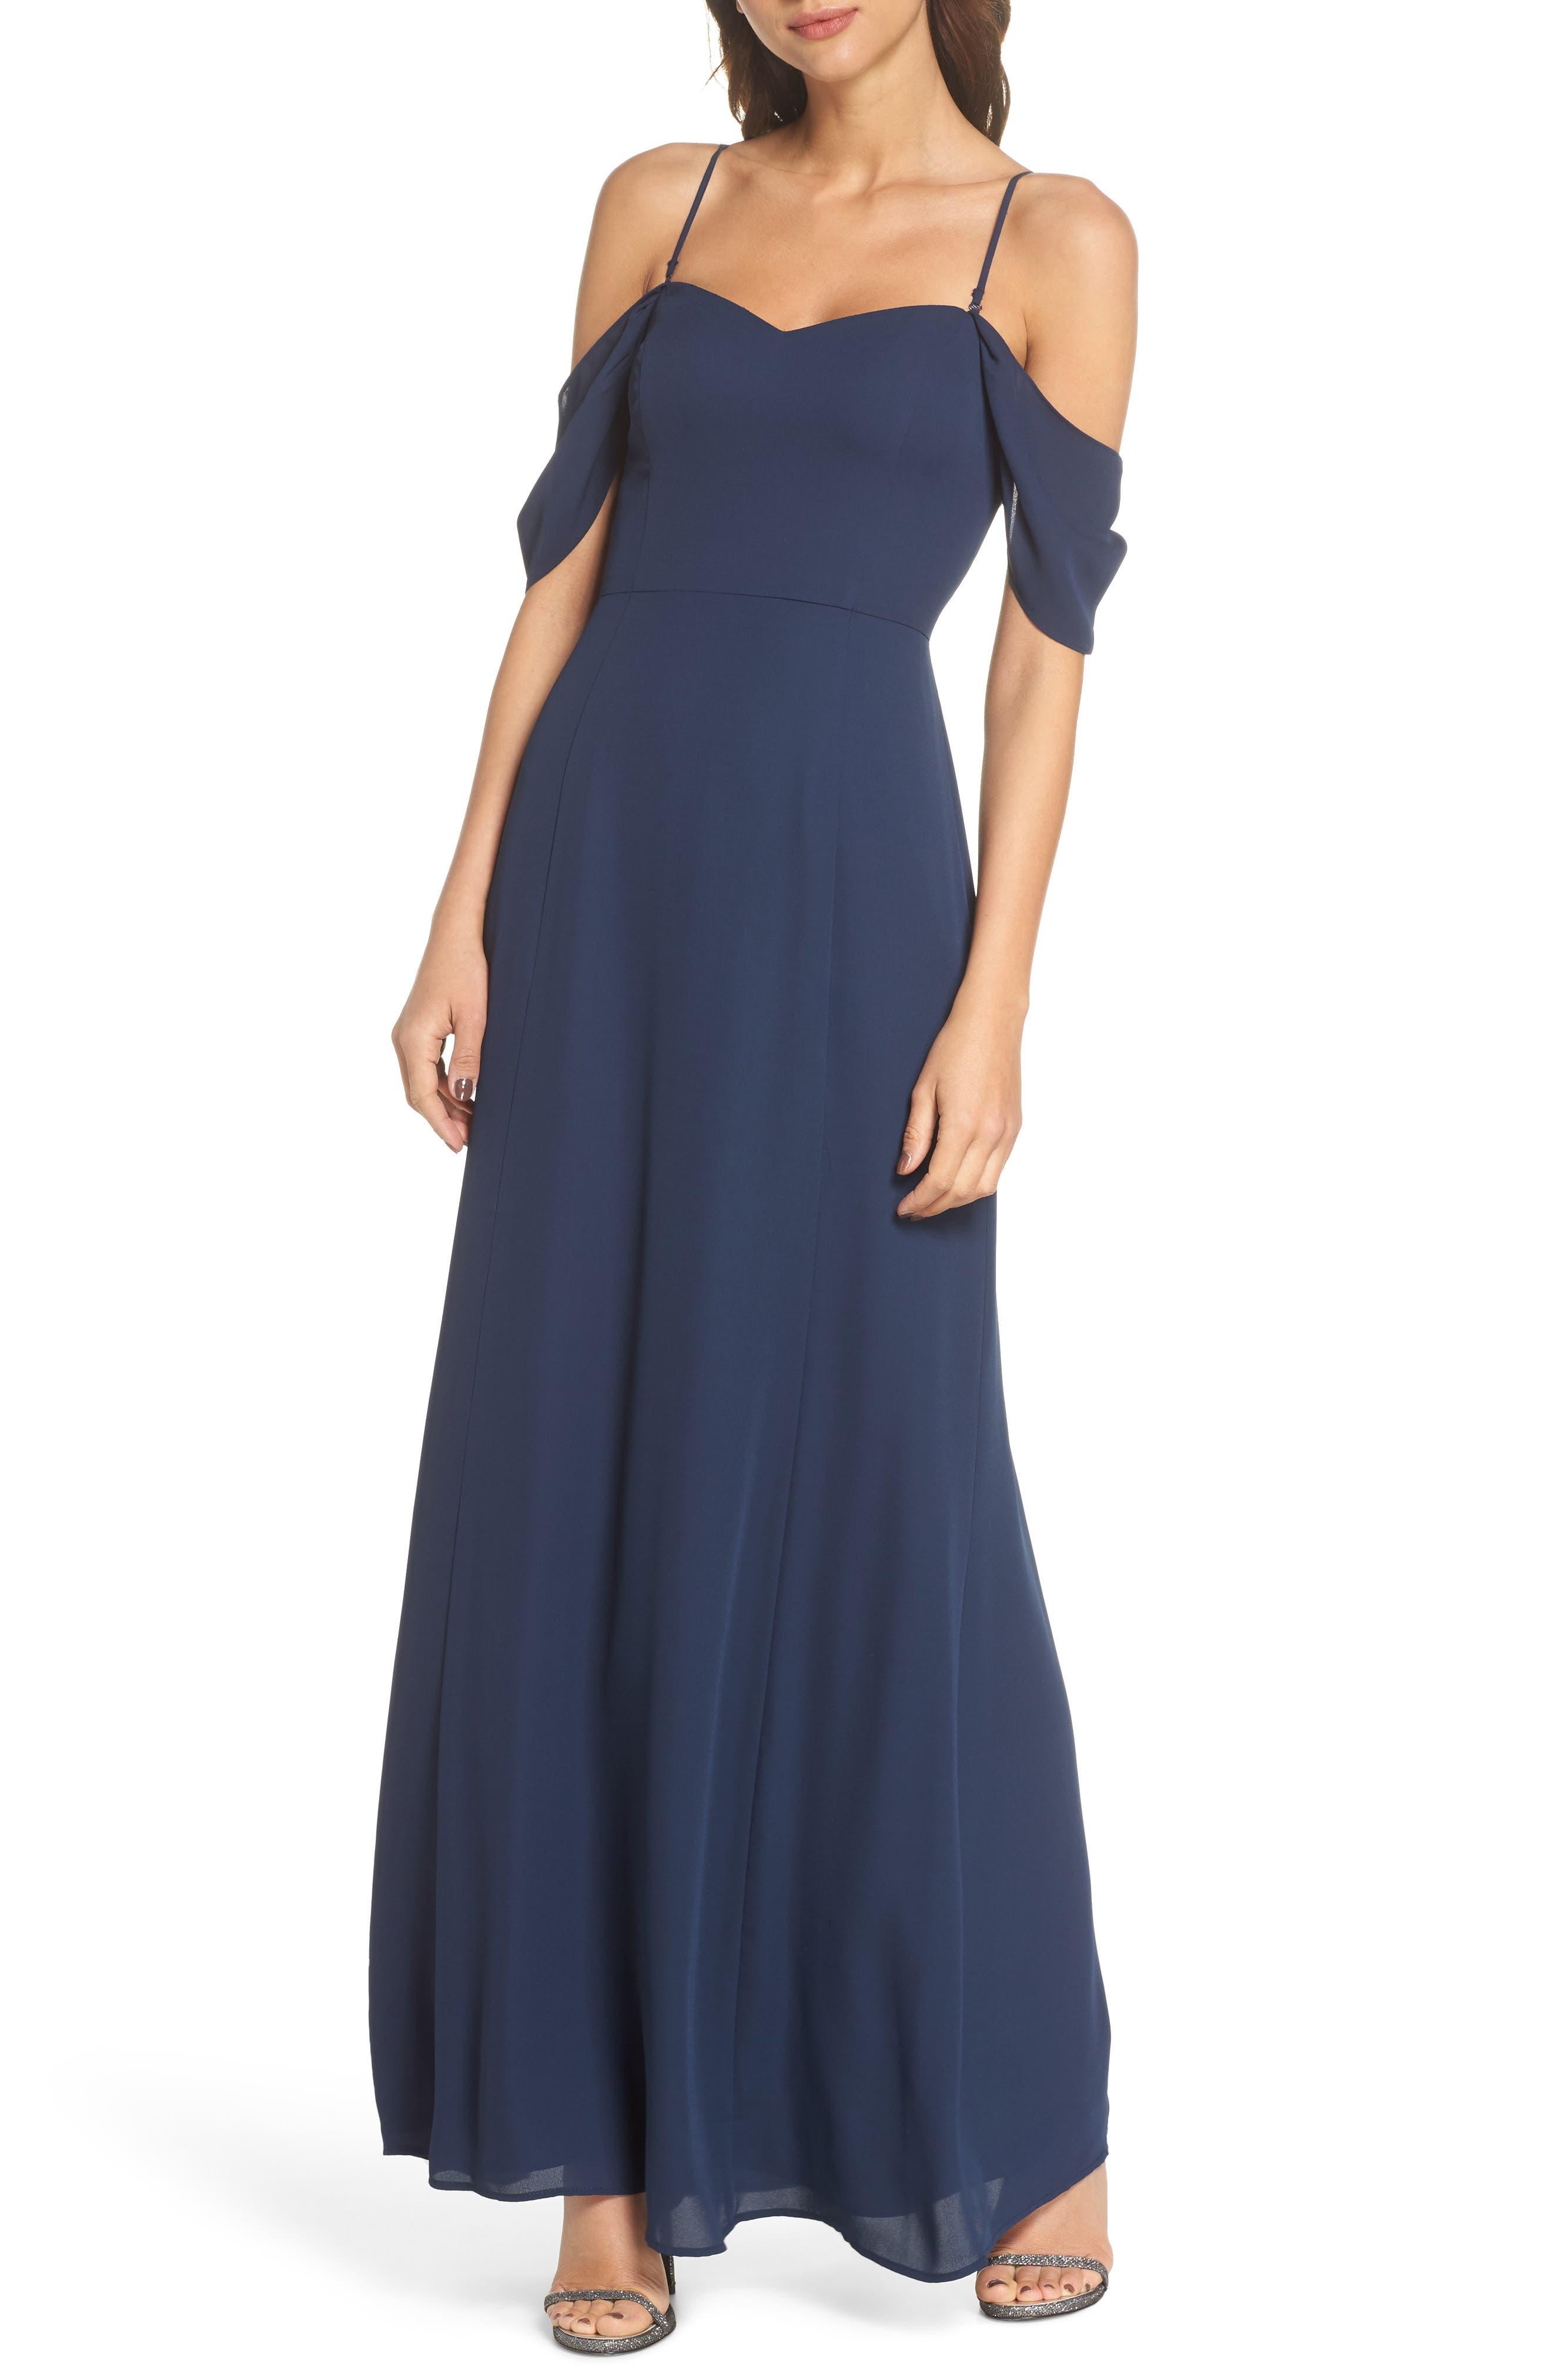 Rachel Off the Shoulder Gored Maxi Dress,                             Alternate thumbnail 8, color,